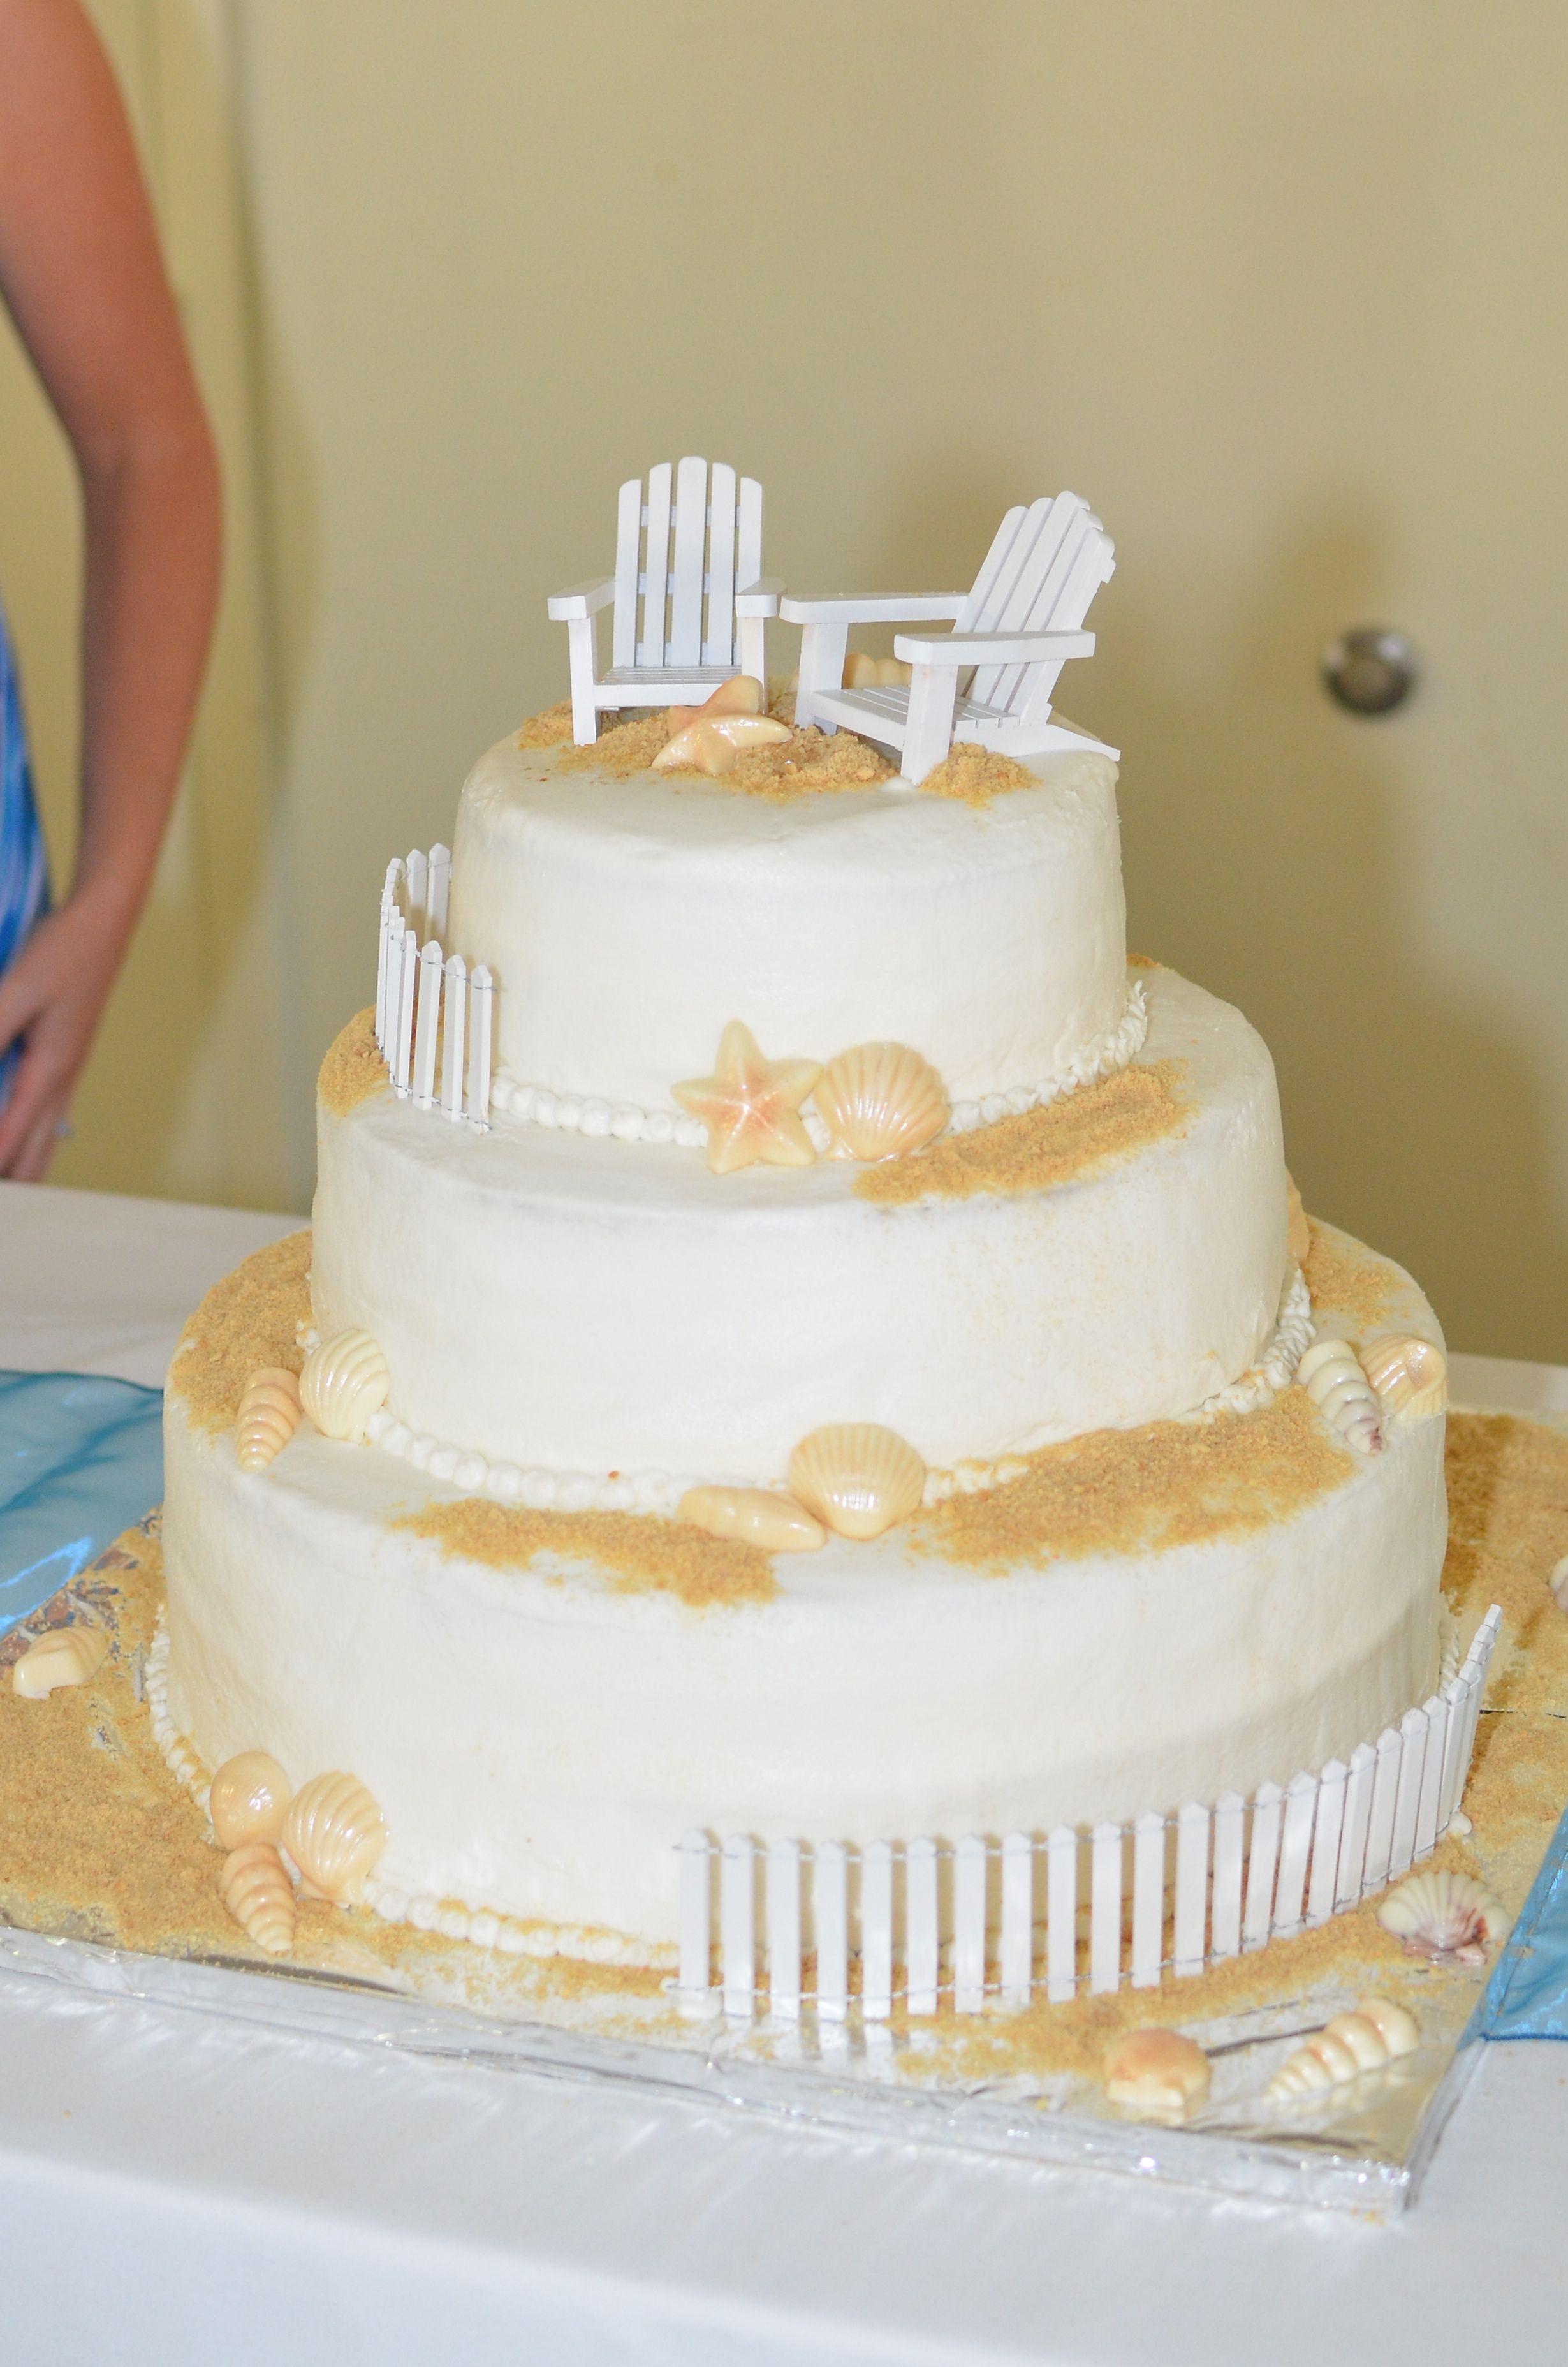 Beach Wedding Cake | My Cakes | Pinterest | Beach wedding cakes ...